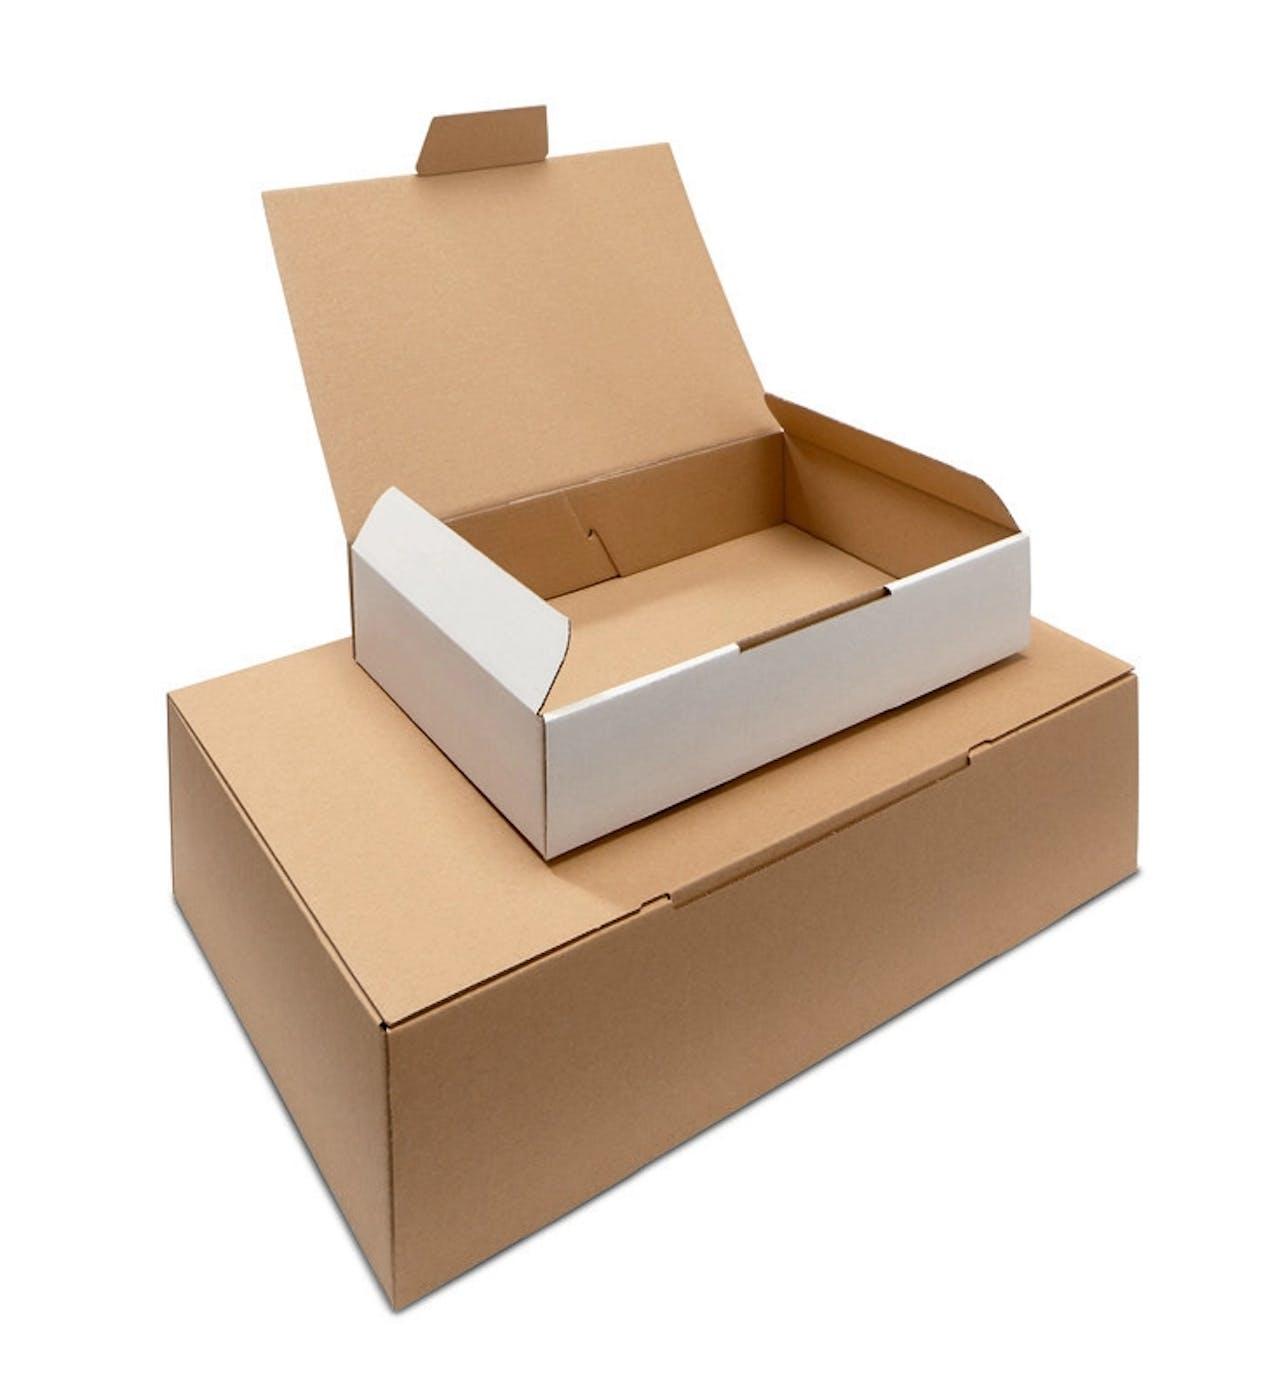 Caisse carton à rabat ECONOMY